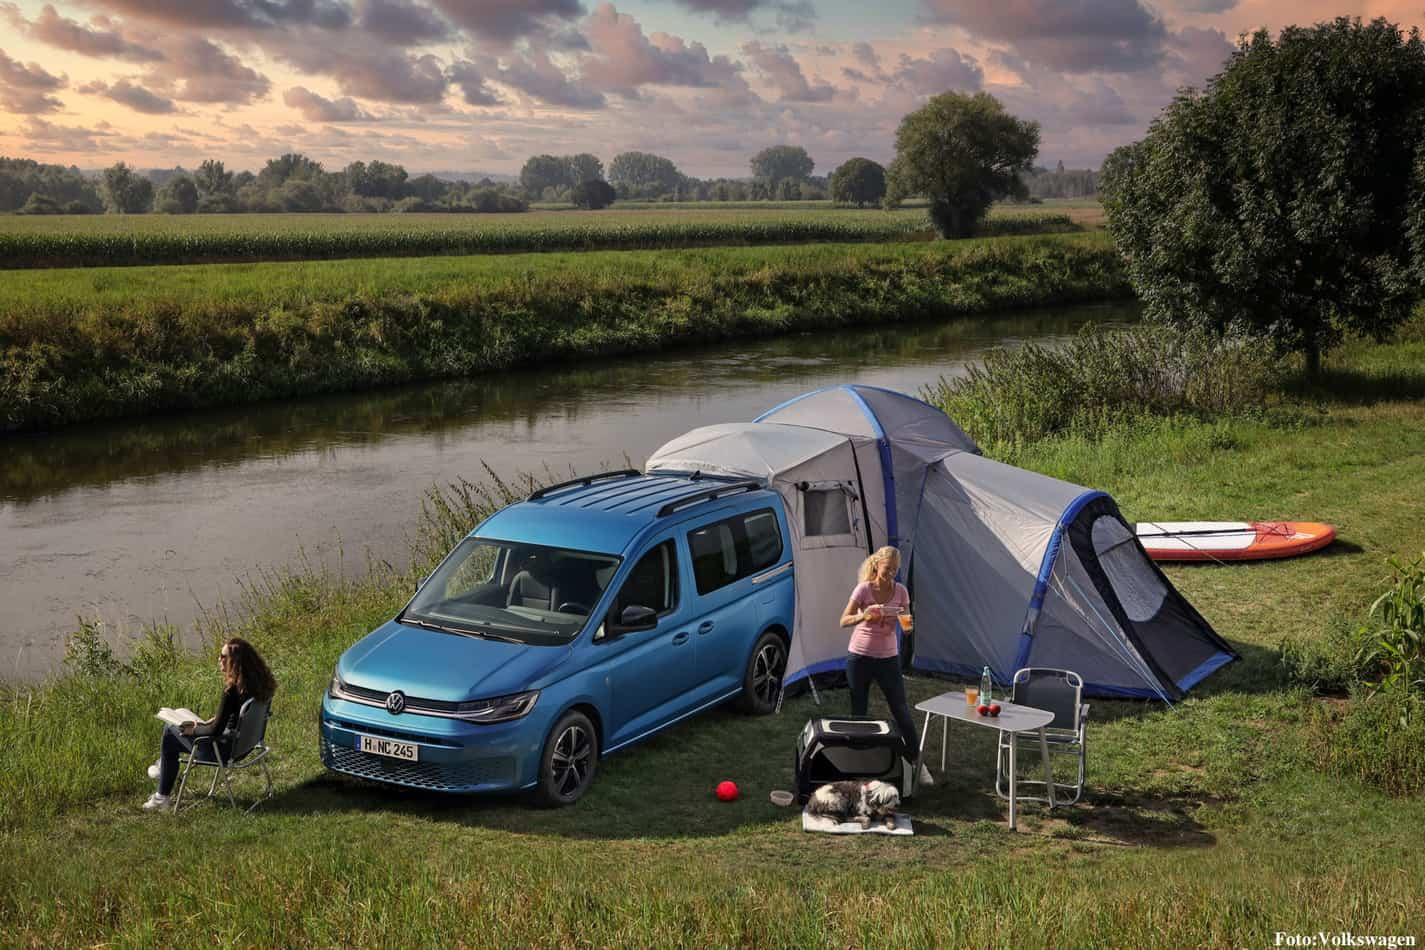 Mini Camper VW Caddy 2021 - Hintergründe, Erfahrungen ...